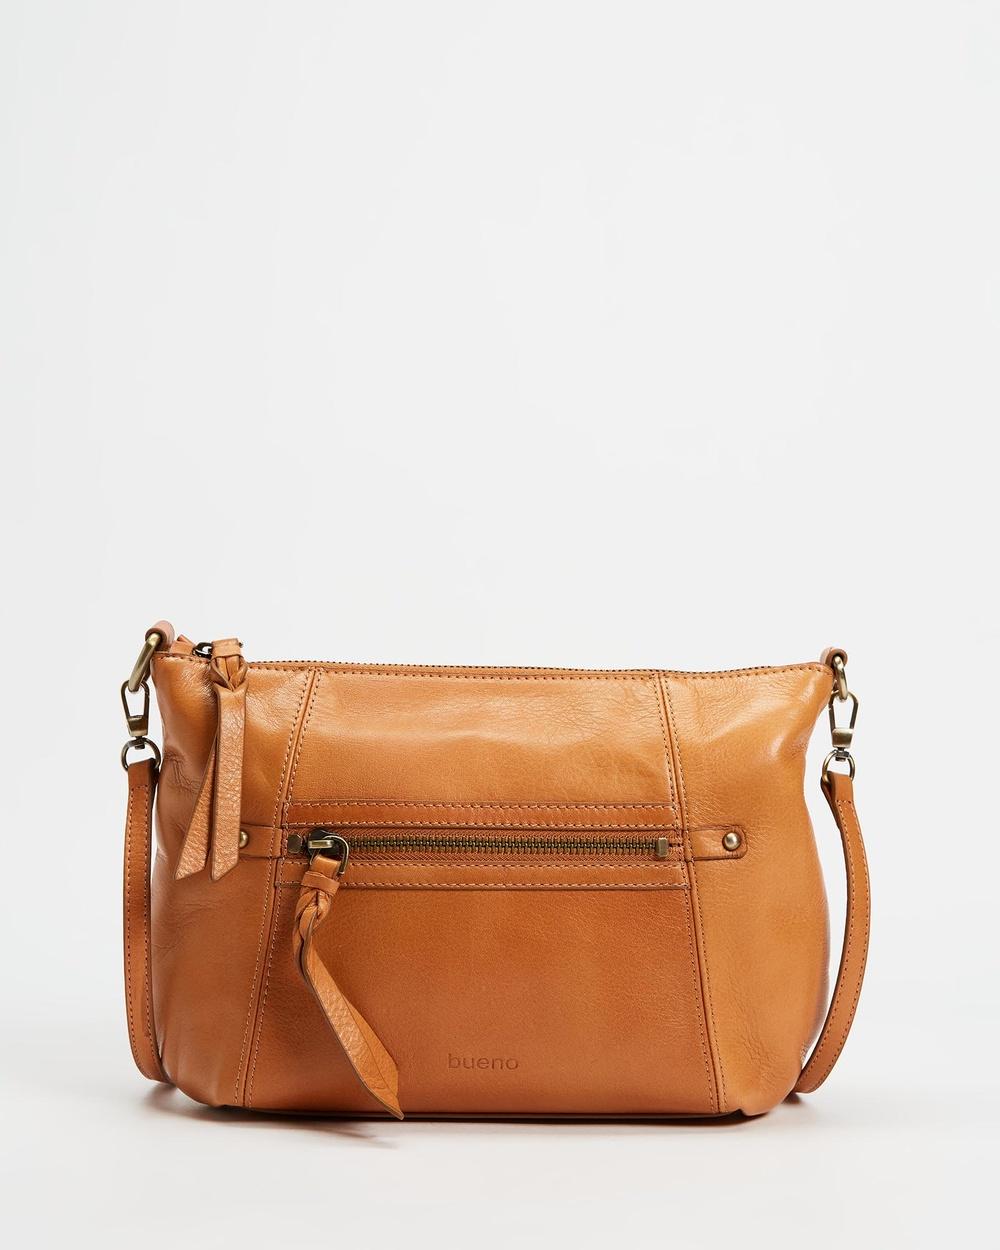 Bueno Diana Handbags Coconut Australia